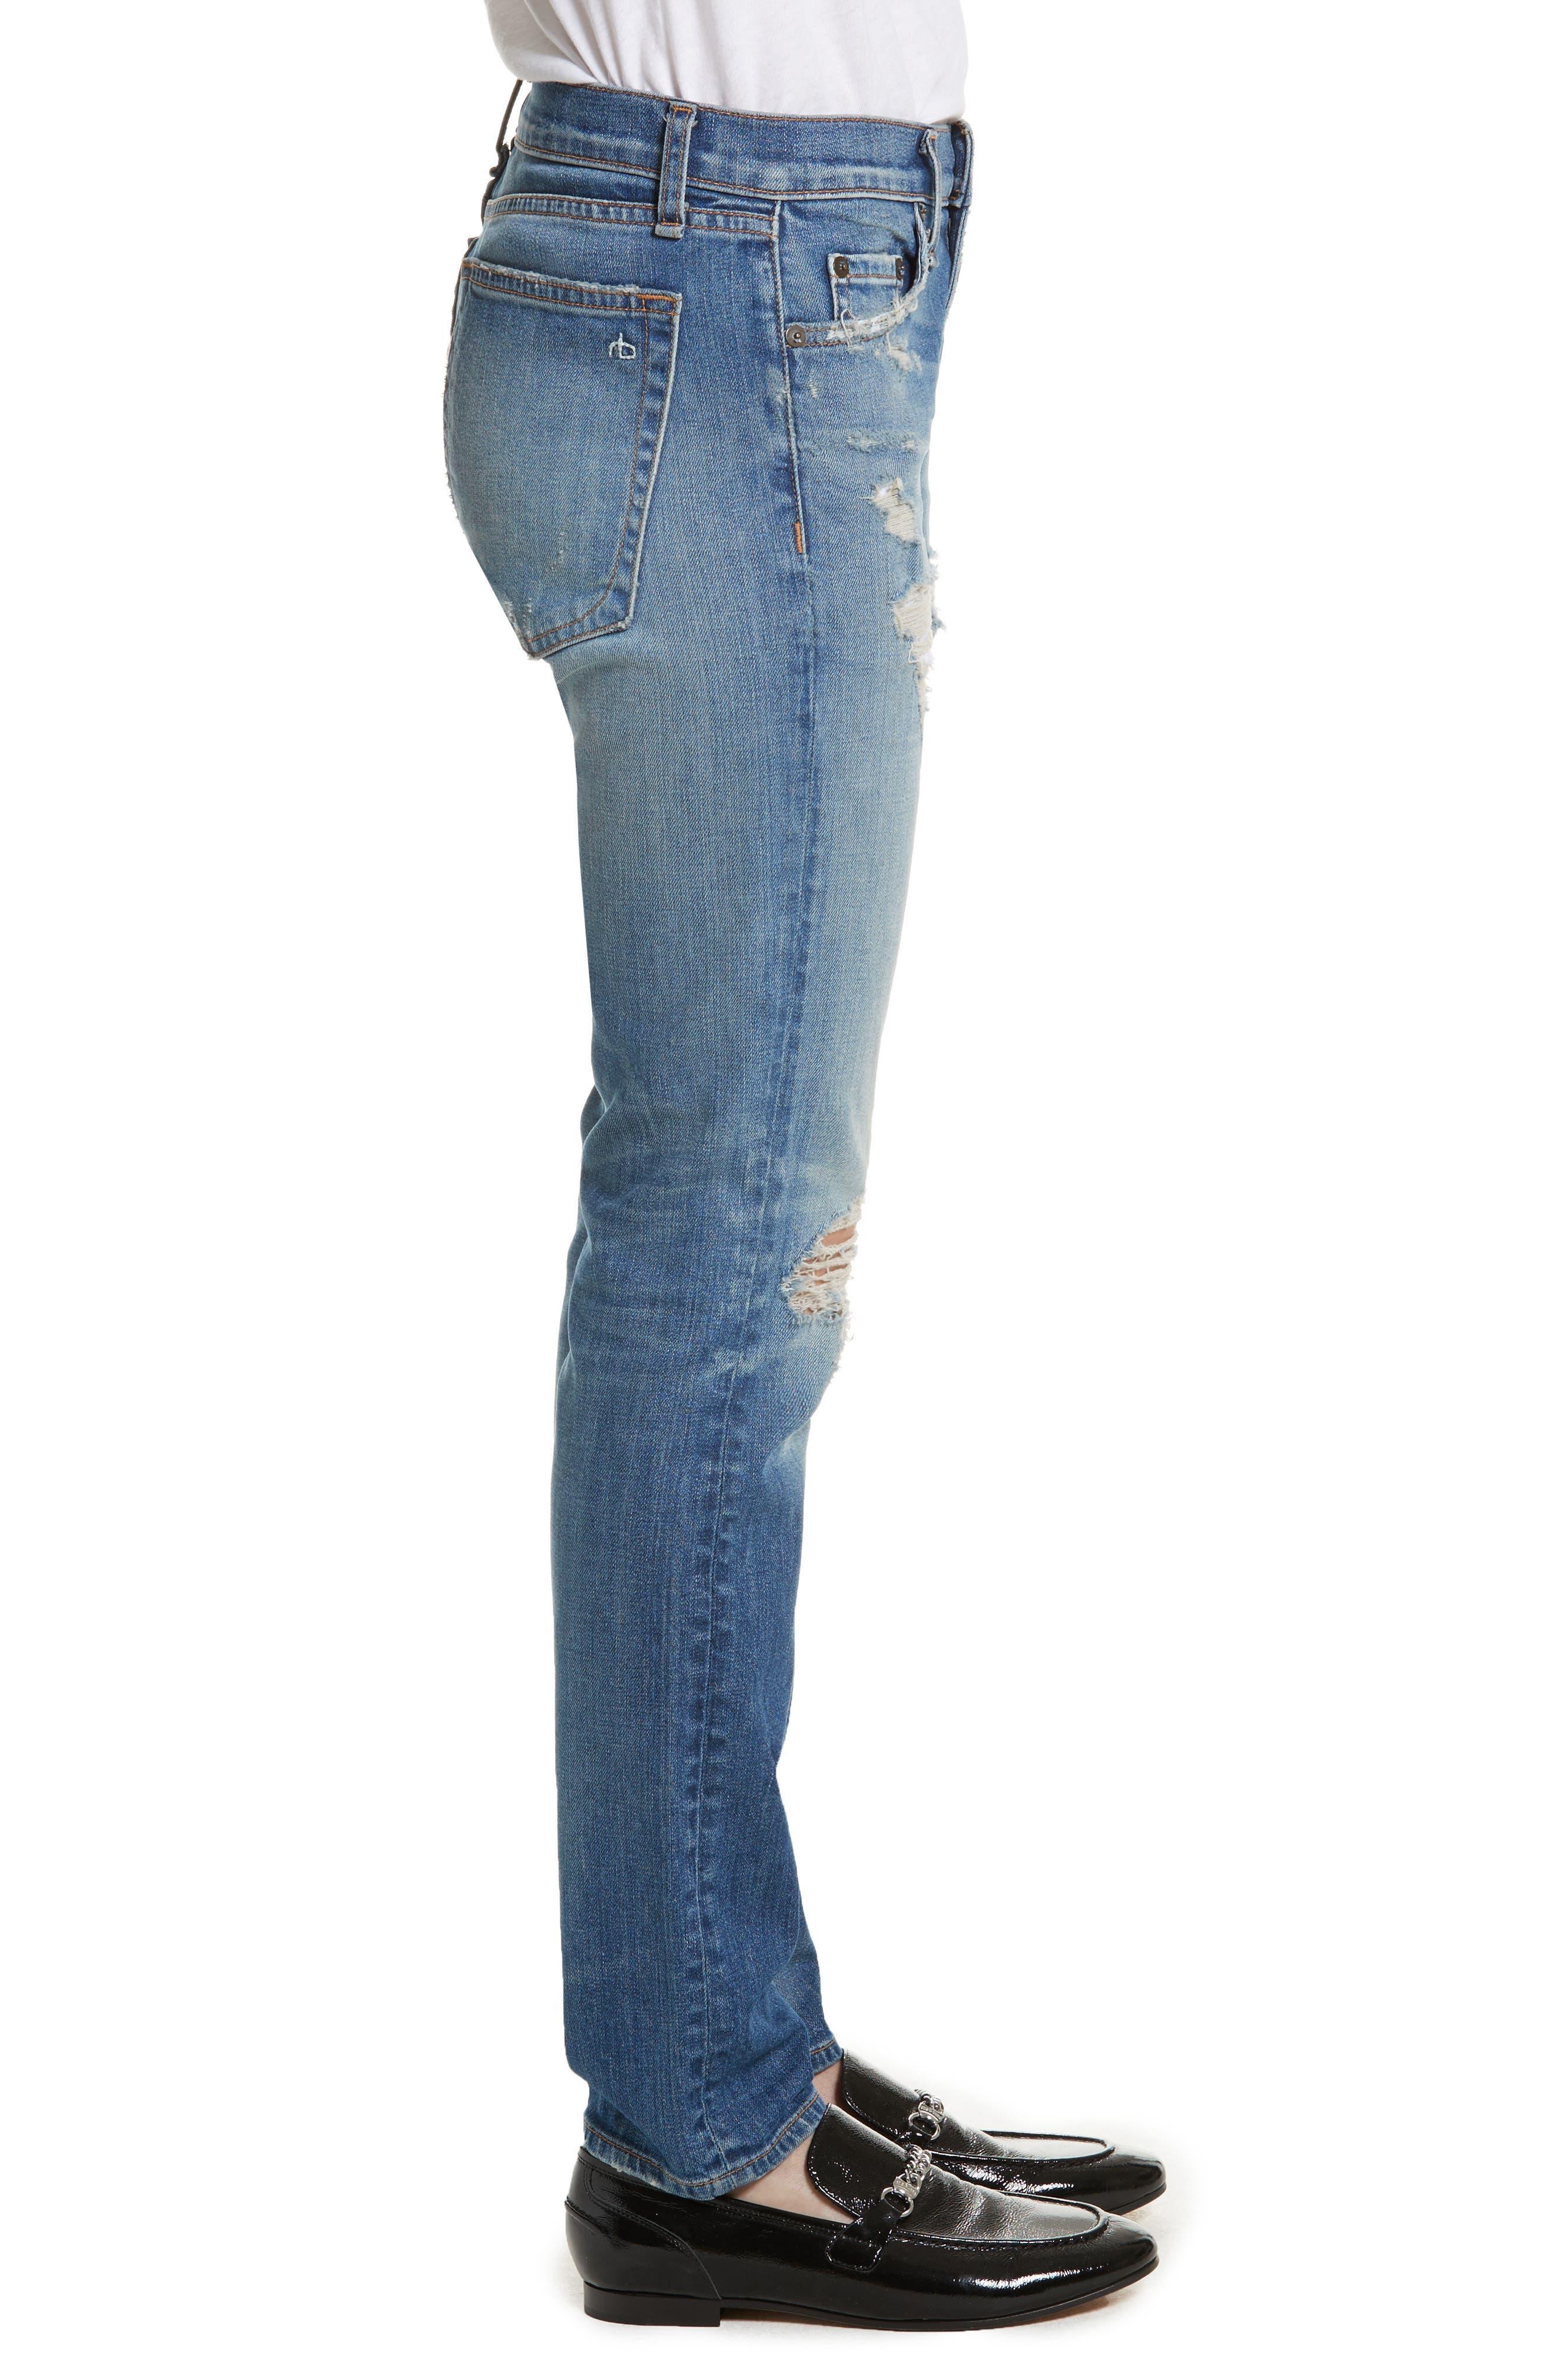 Alternate Image 3  - rag & bone/JEAN Dre Slim Boyfriend Jeans (Ervs)